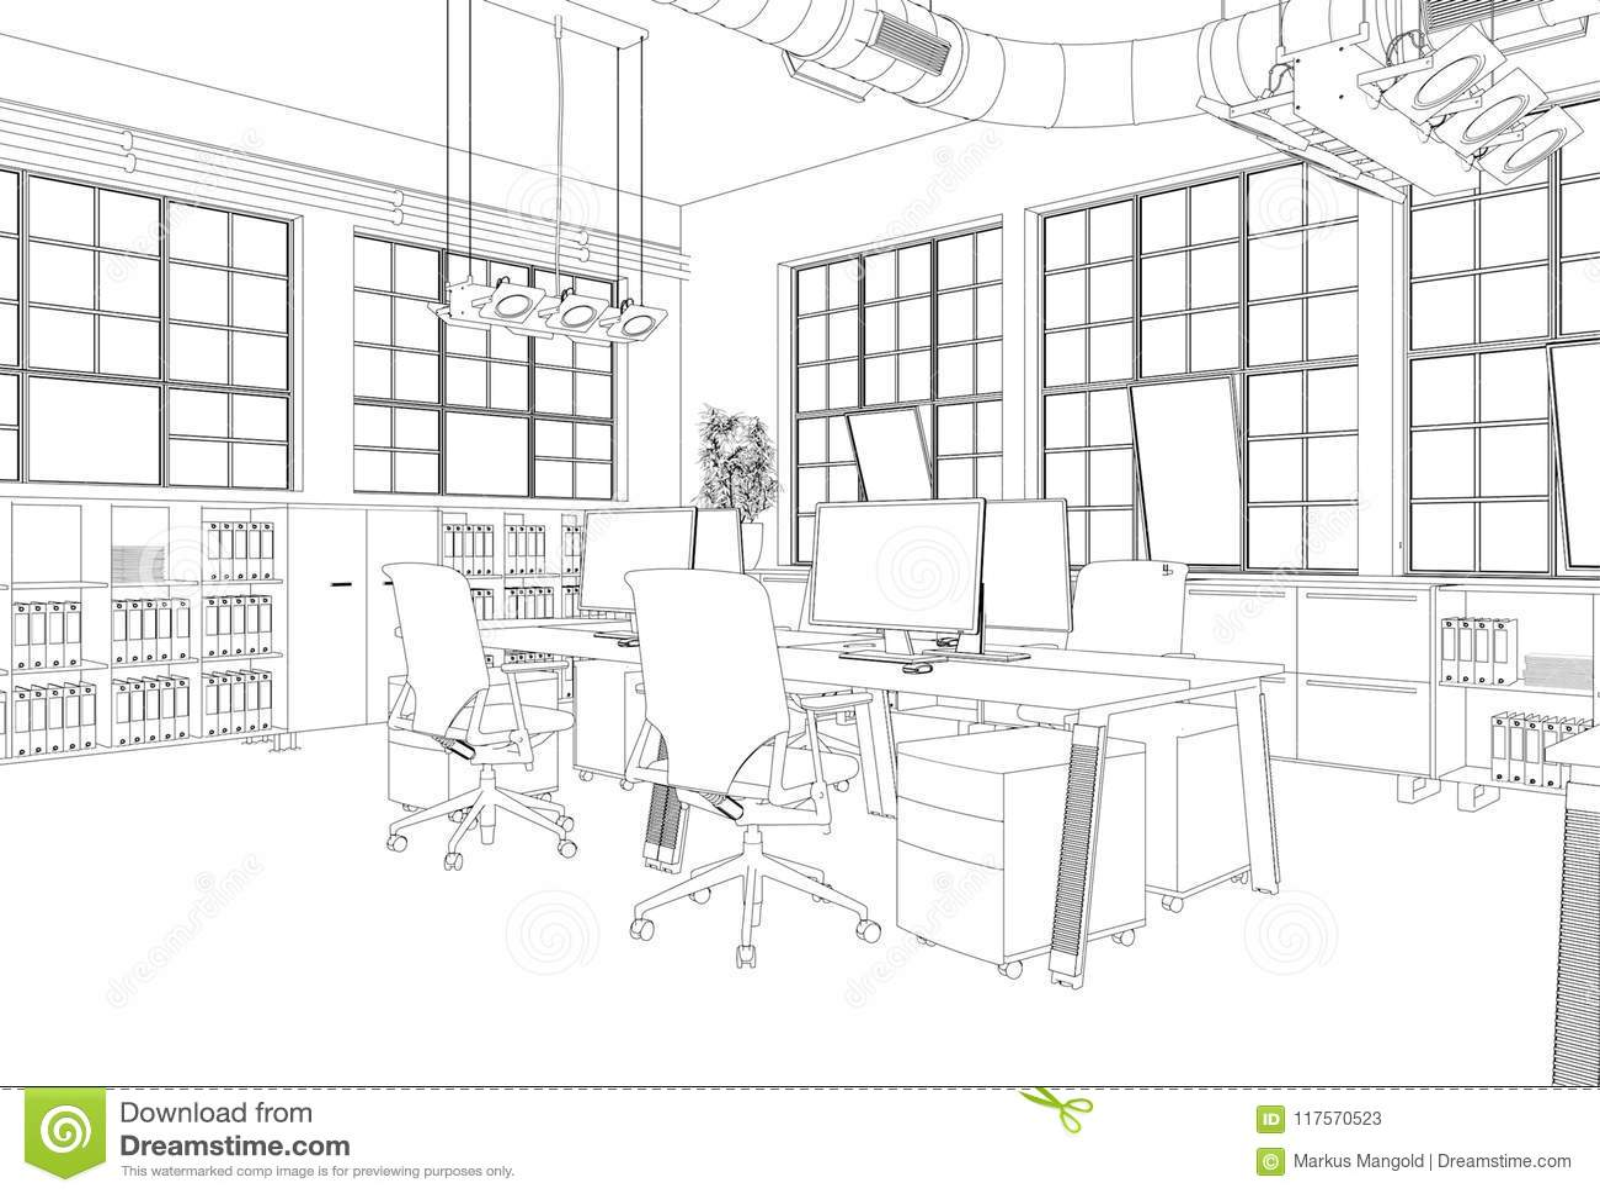 Interior Design Big Office Room With Desks Custom Drawing Stock Illustration Illustration Of Composition Construction 117570523